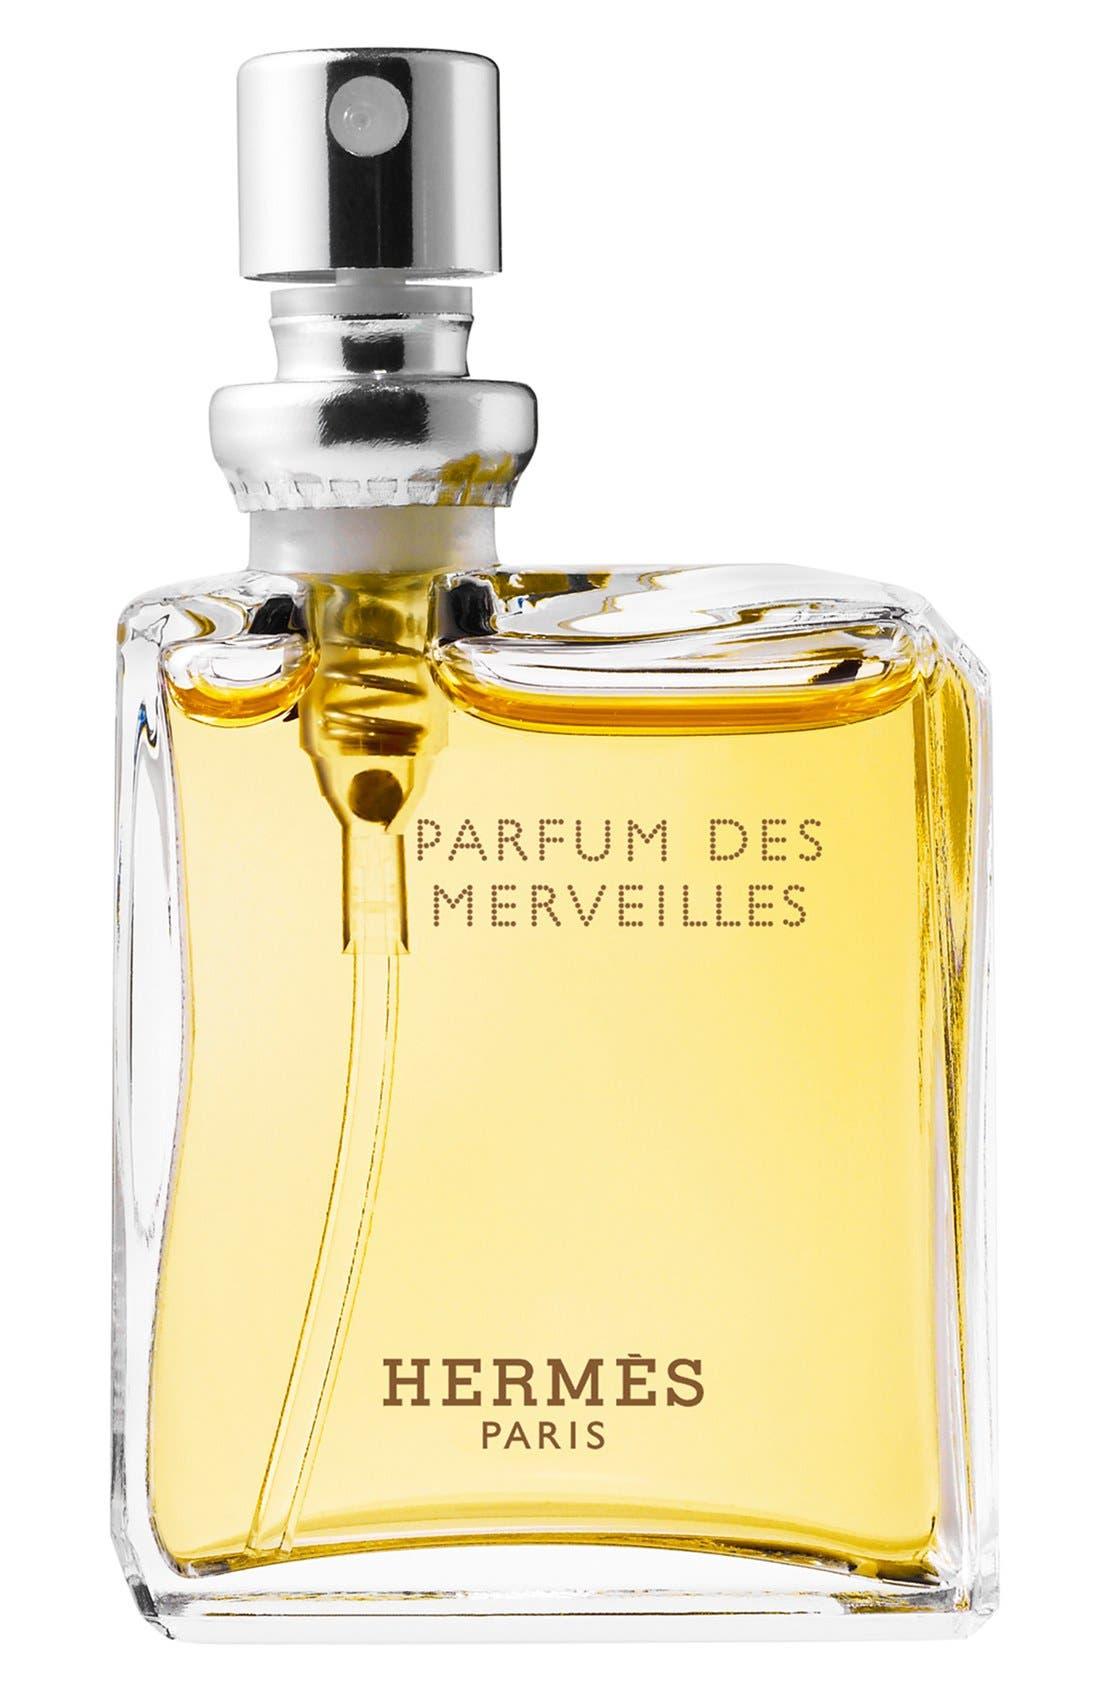 Hermès Eau des Merveilles Parfum des Merveilles - Pure perfume lock spray refill